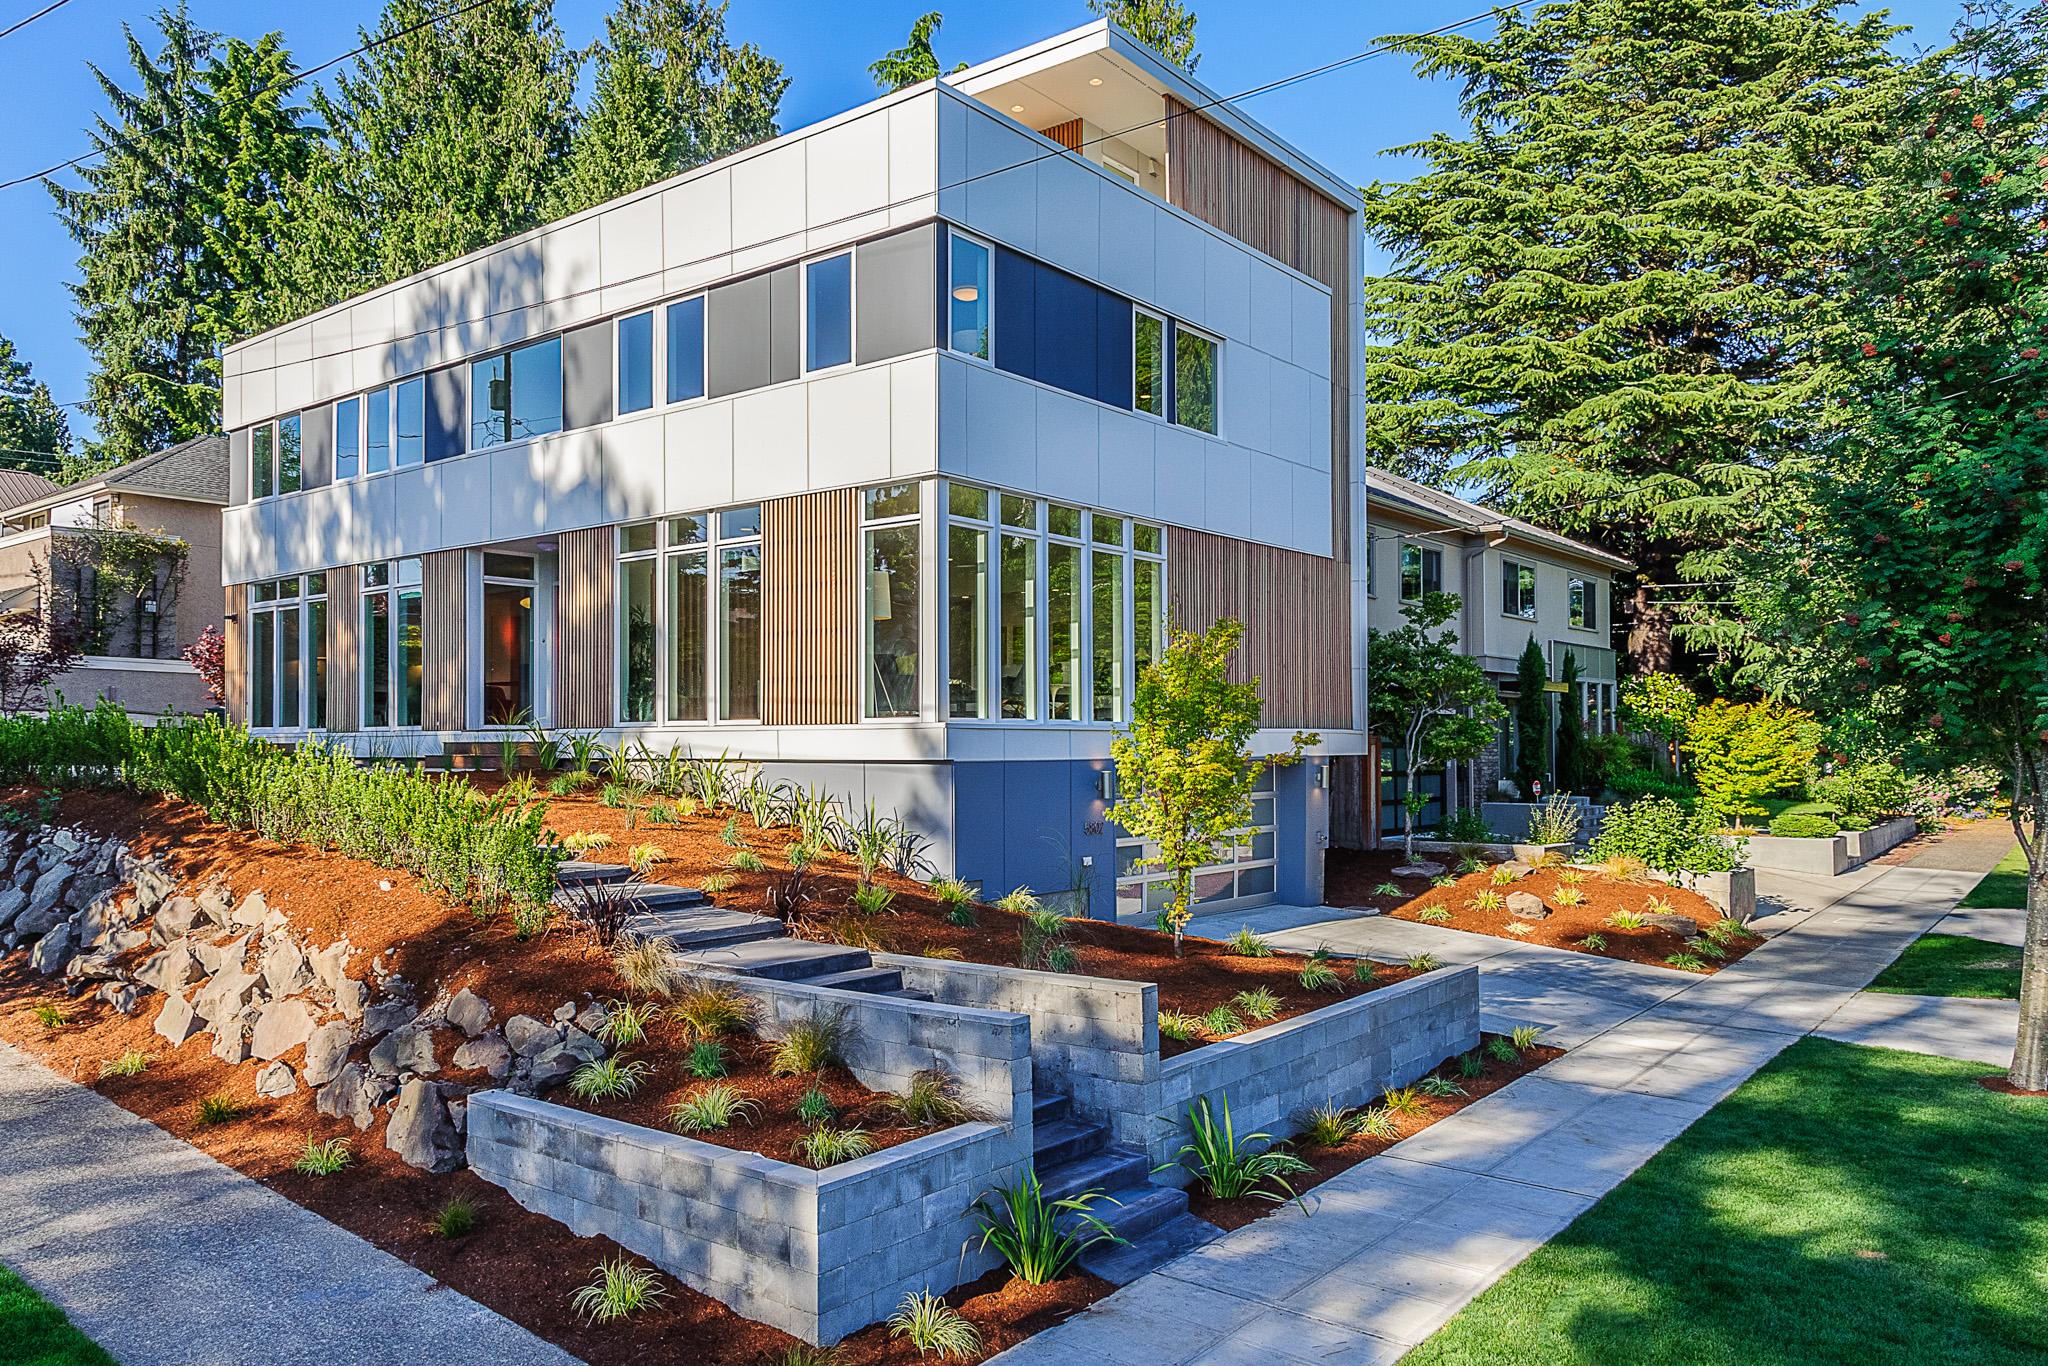 Hawthorne Hills Modern Home Yard and Exterior